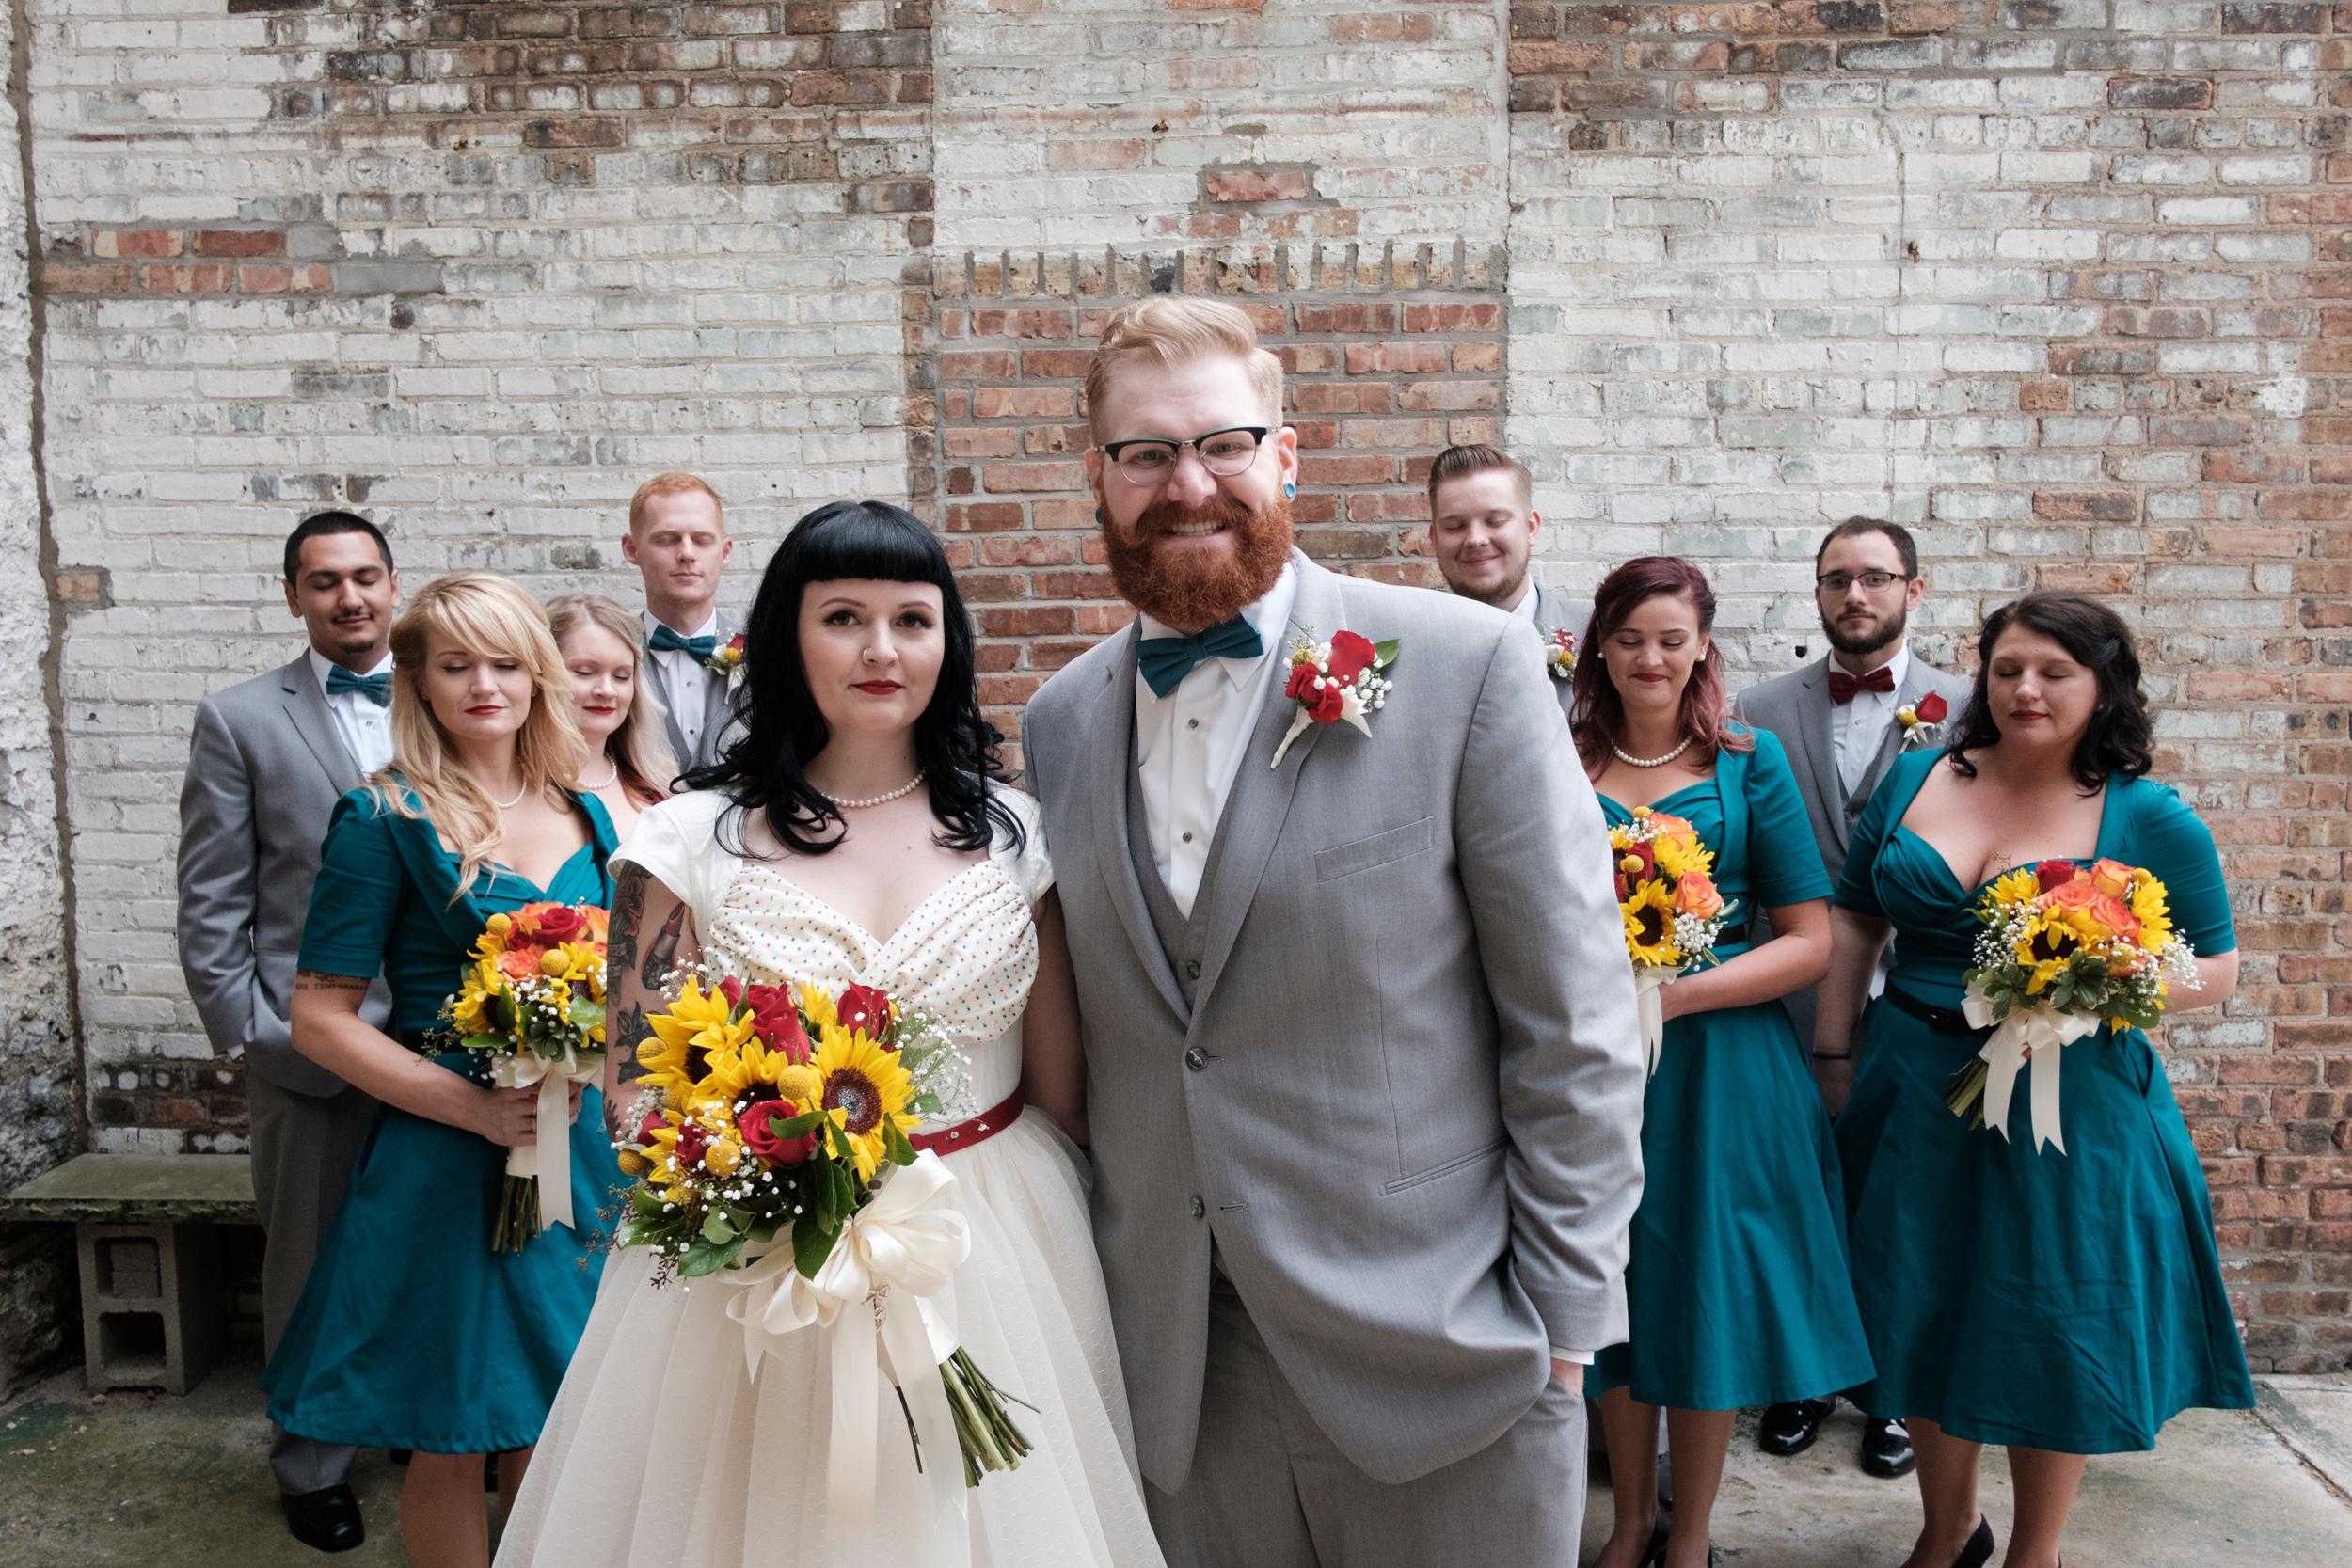 Christian & Sarah wedding photography by Brian milo-192.jpg